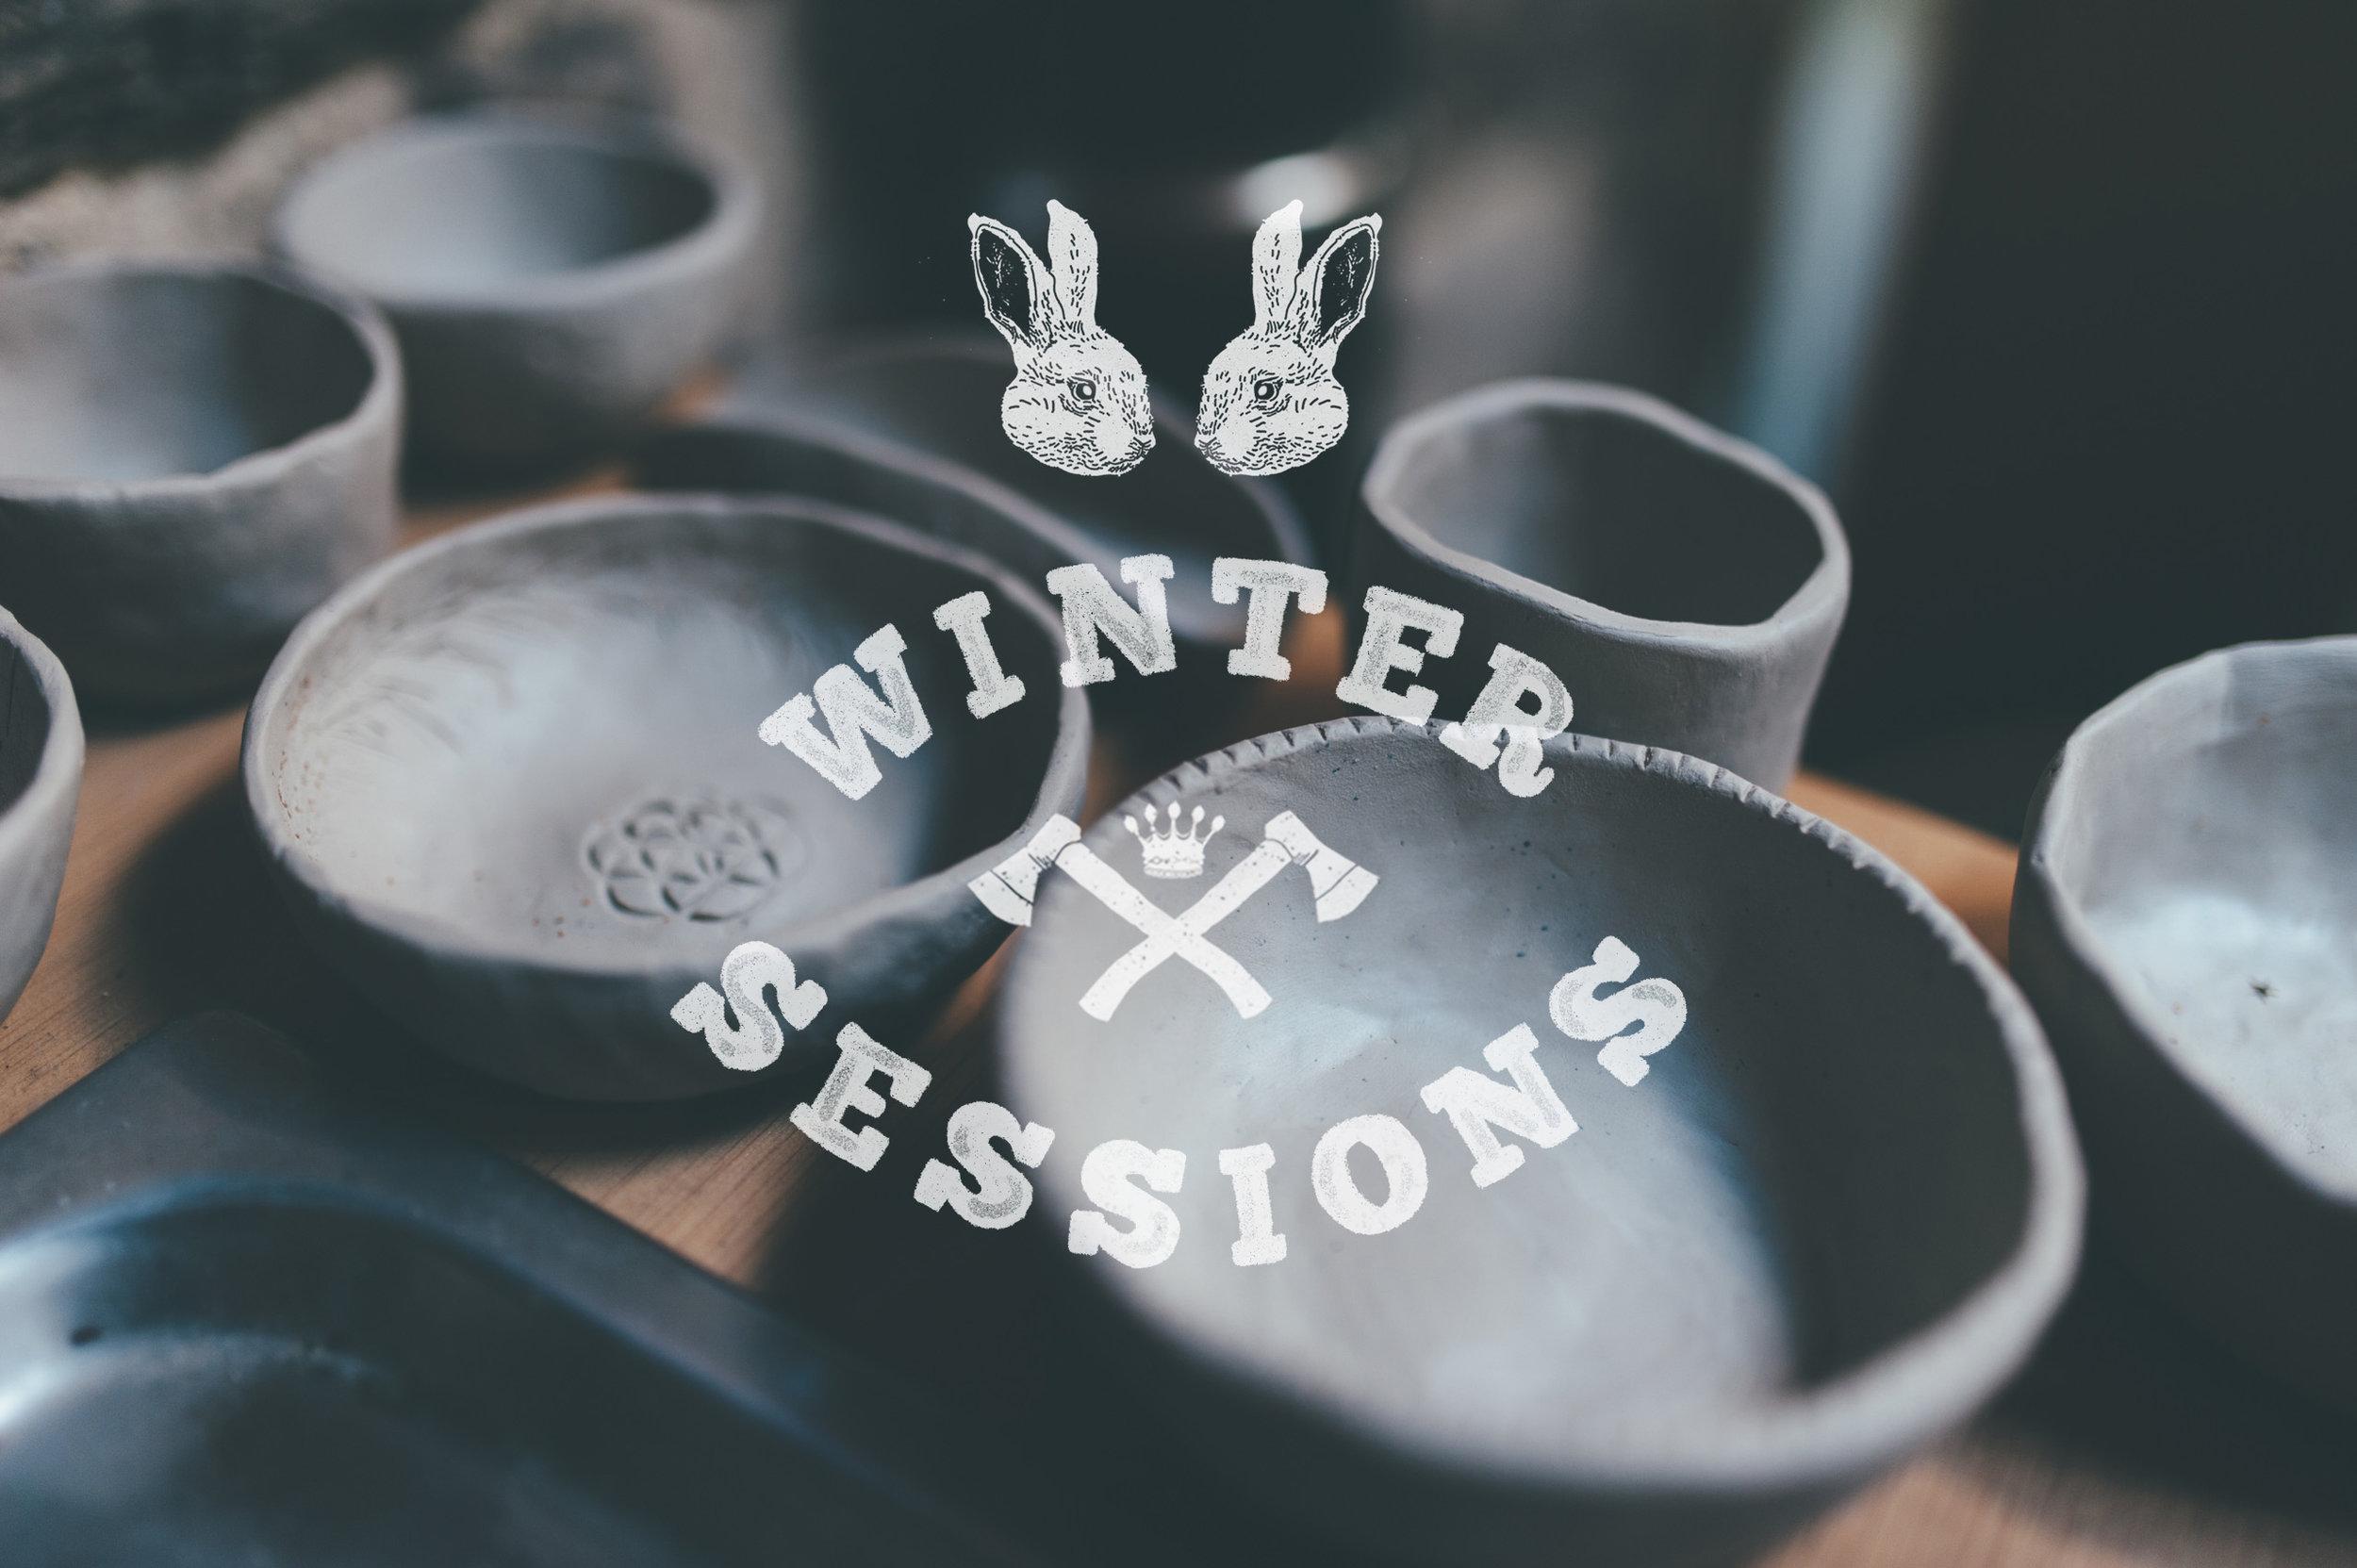 Winter Sessions at Castelo Studio